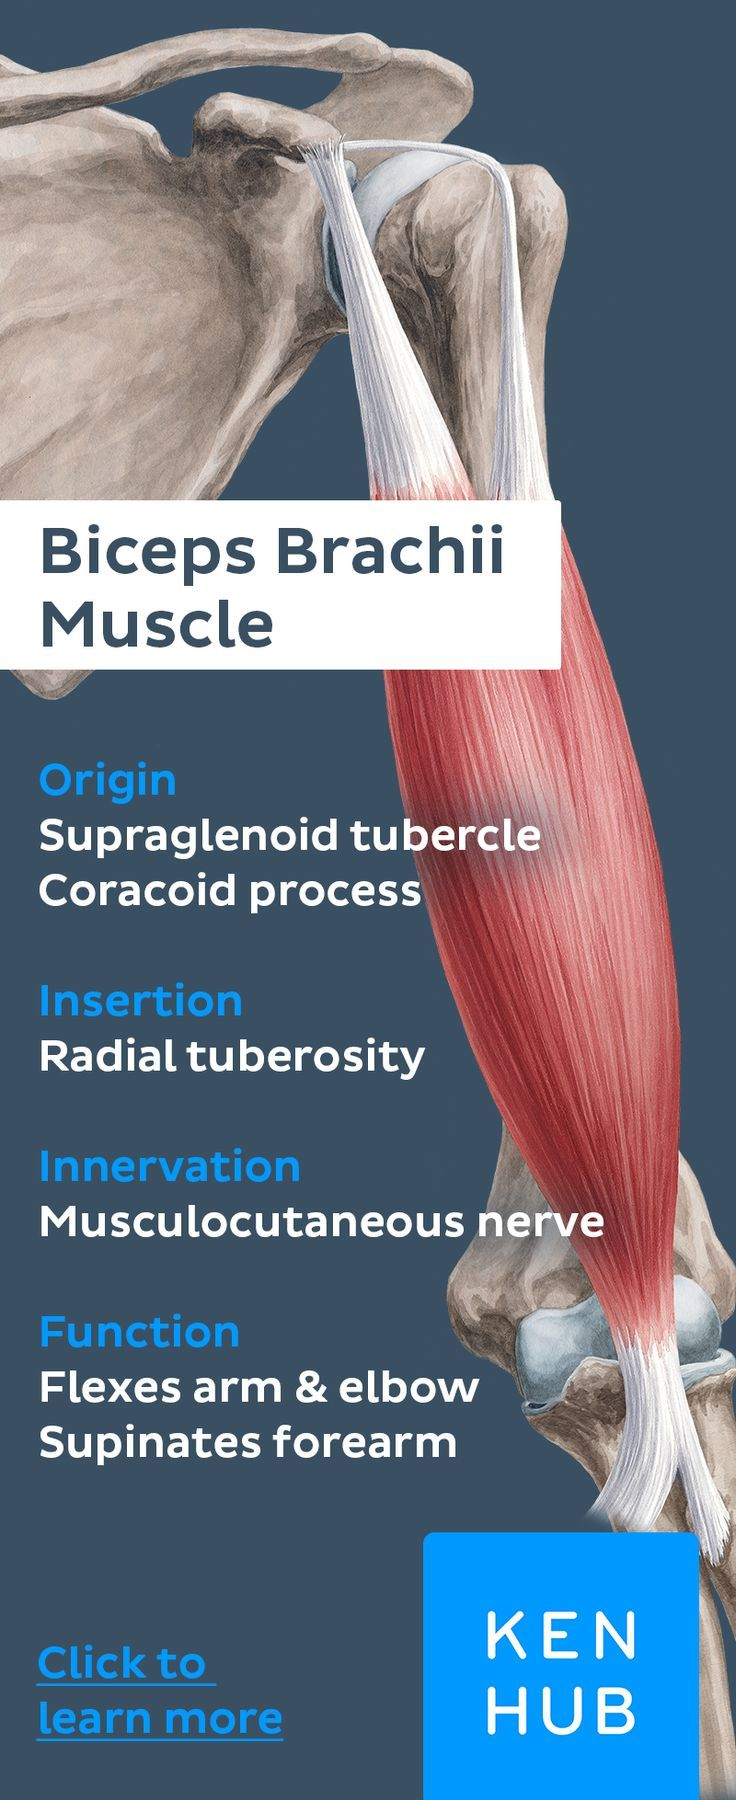 Biceps brachii muscle | Anatomía, Terapia y Anatomía humana